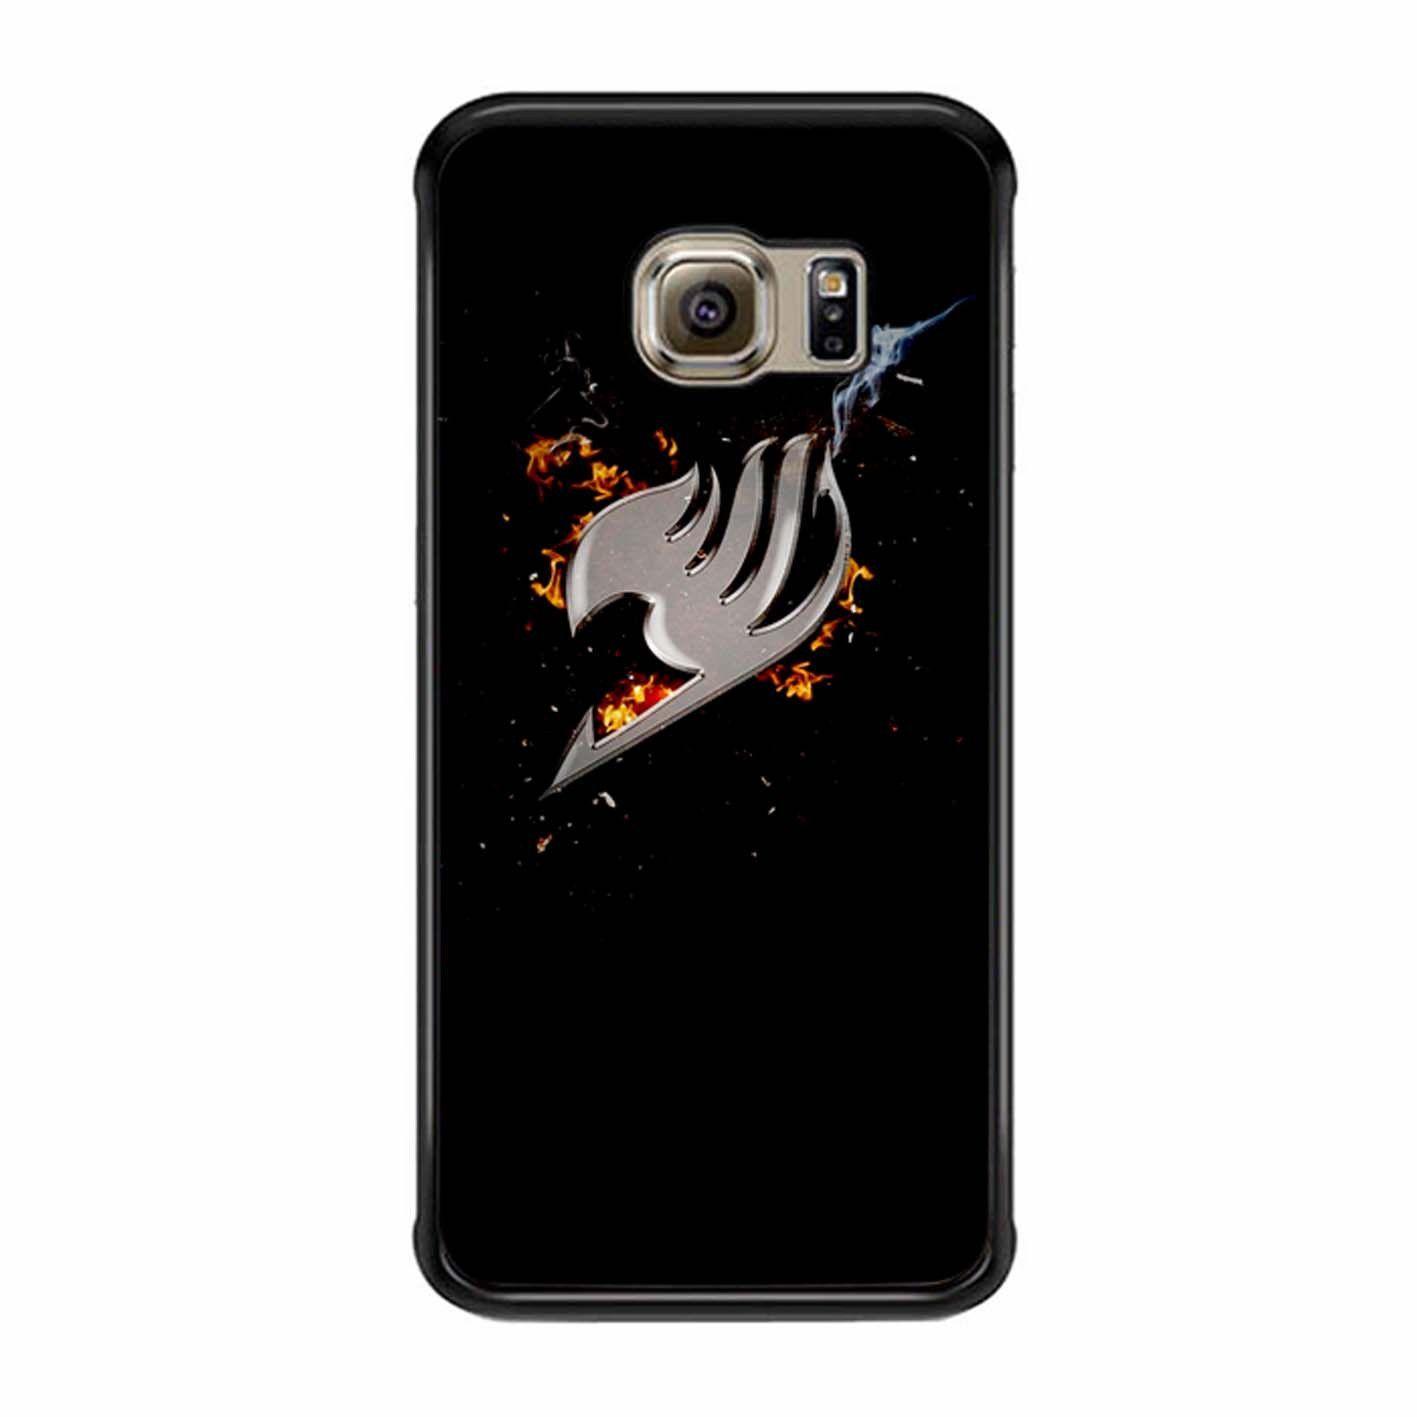 Fairy Tail Manga Anime Samsung Galaxy S6 Edge Case | Fairy tail ...